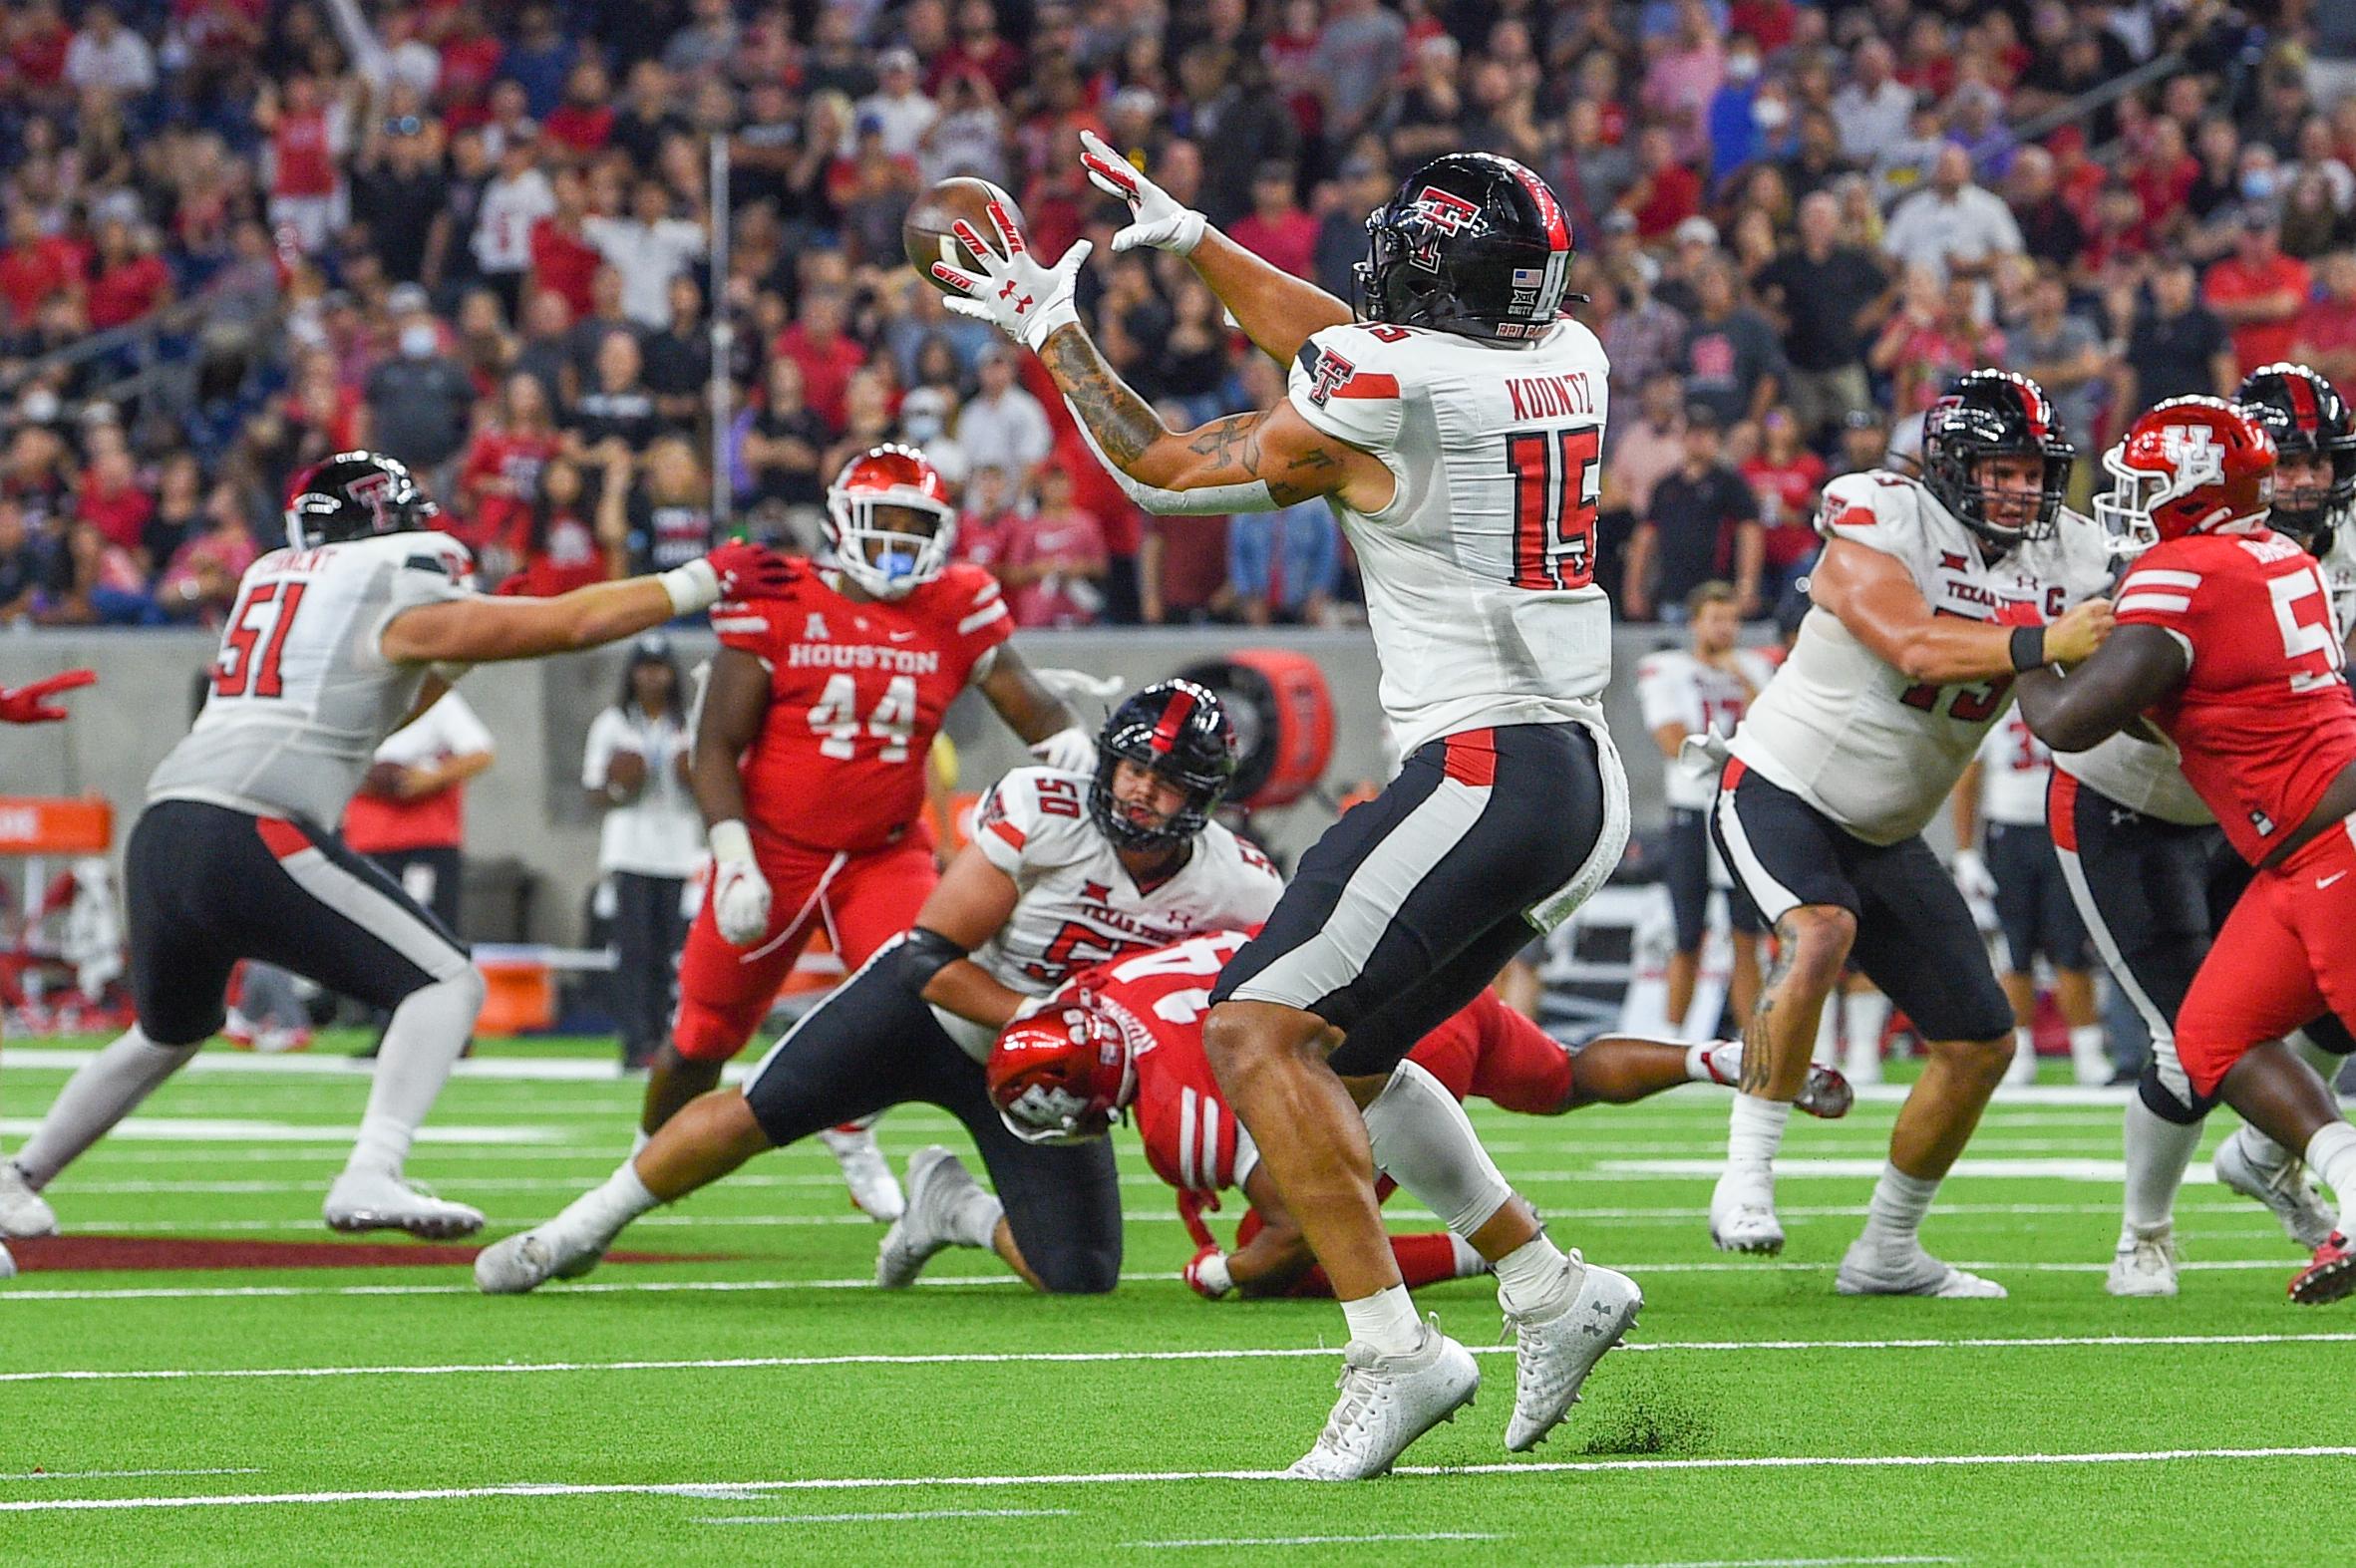 COLLEGE FOOTBALL: SEP 04 Texas Kickoff - Texas Tech v Houston